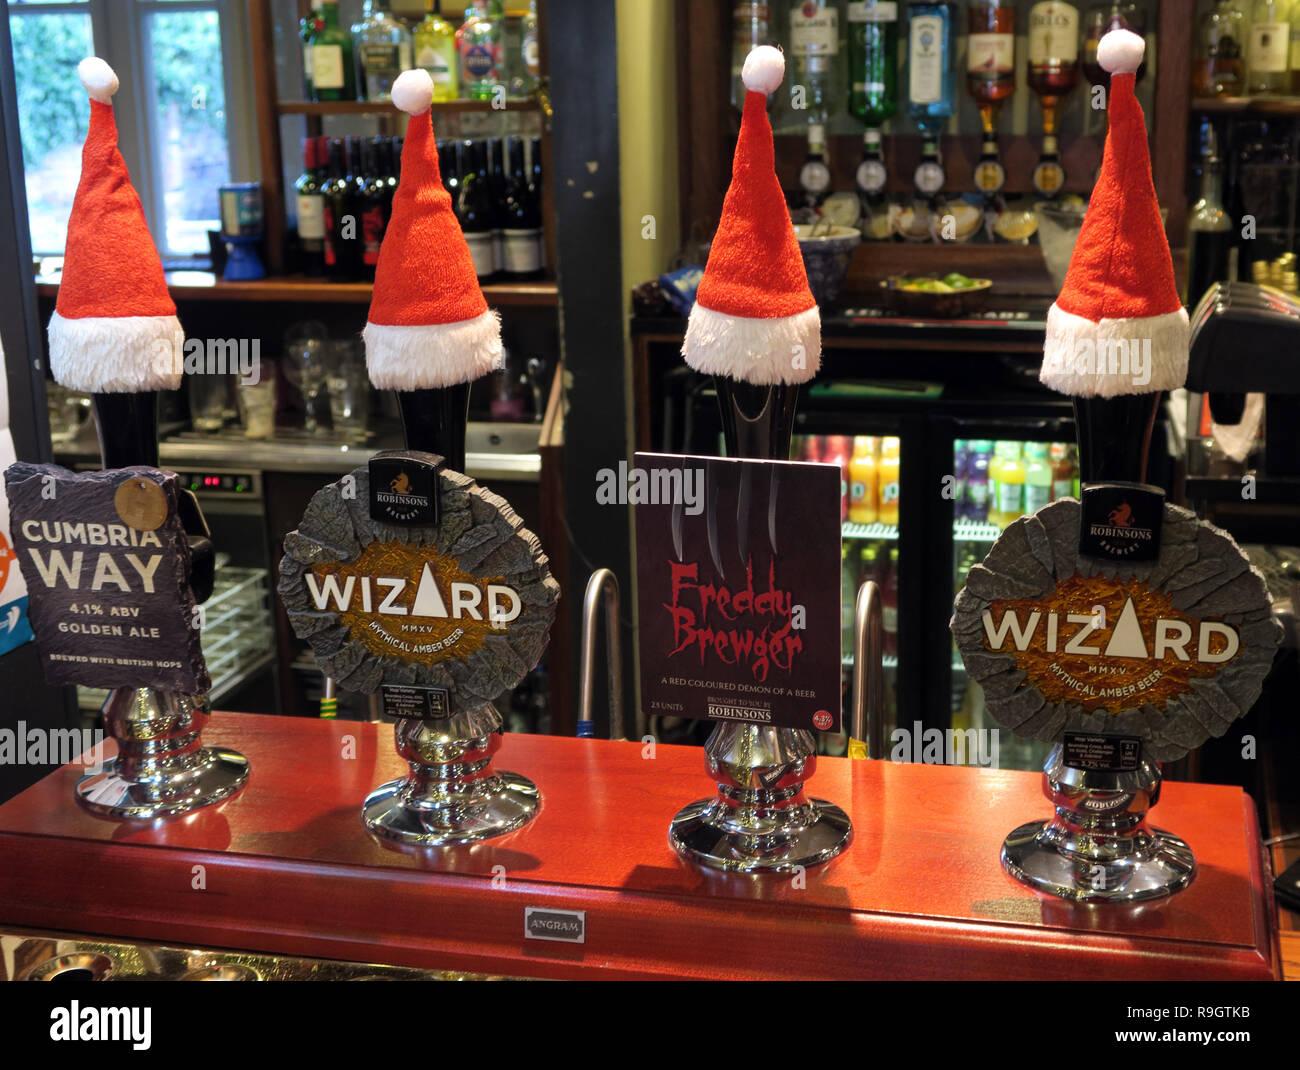 GoTonySmith,@HotpixUK,HotpixUK,Xmas,Christmas,real